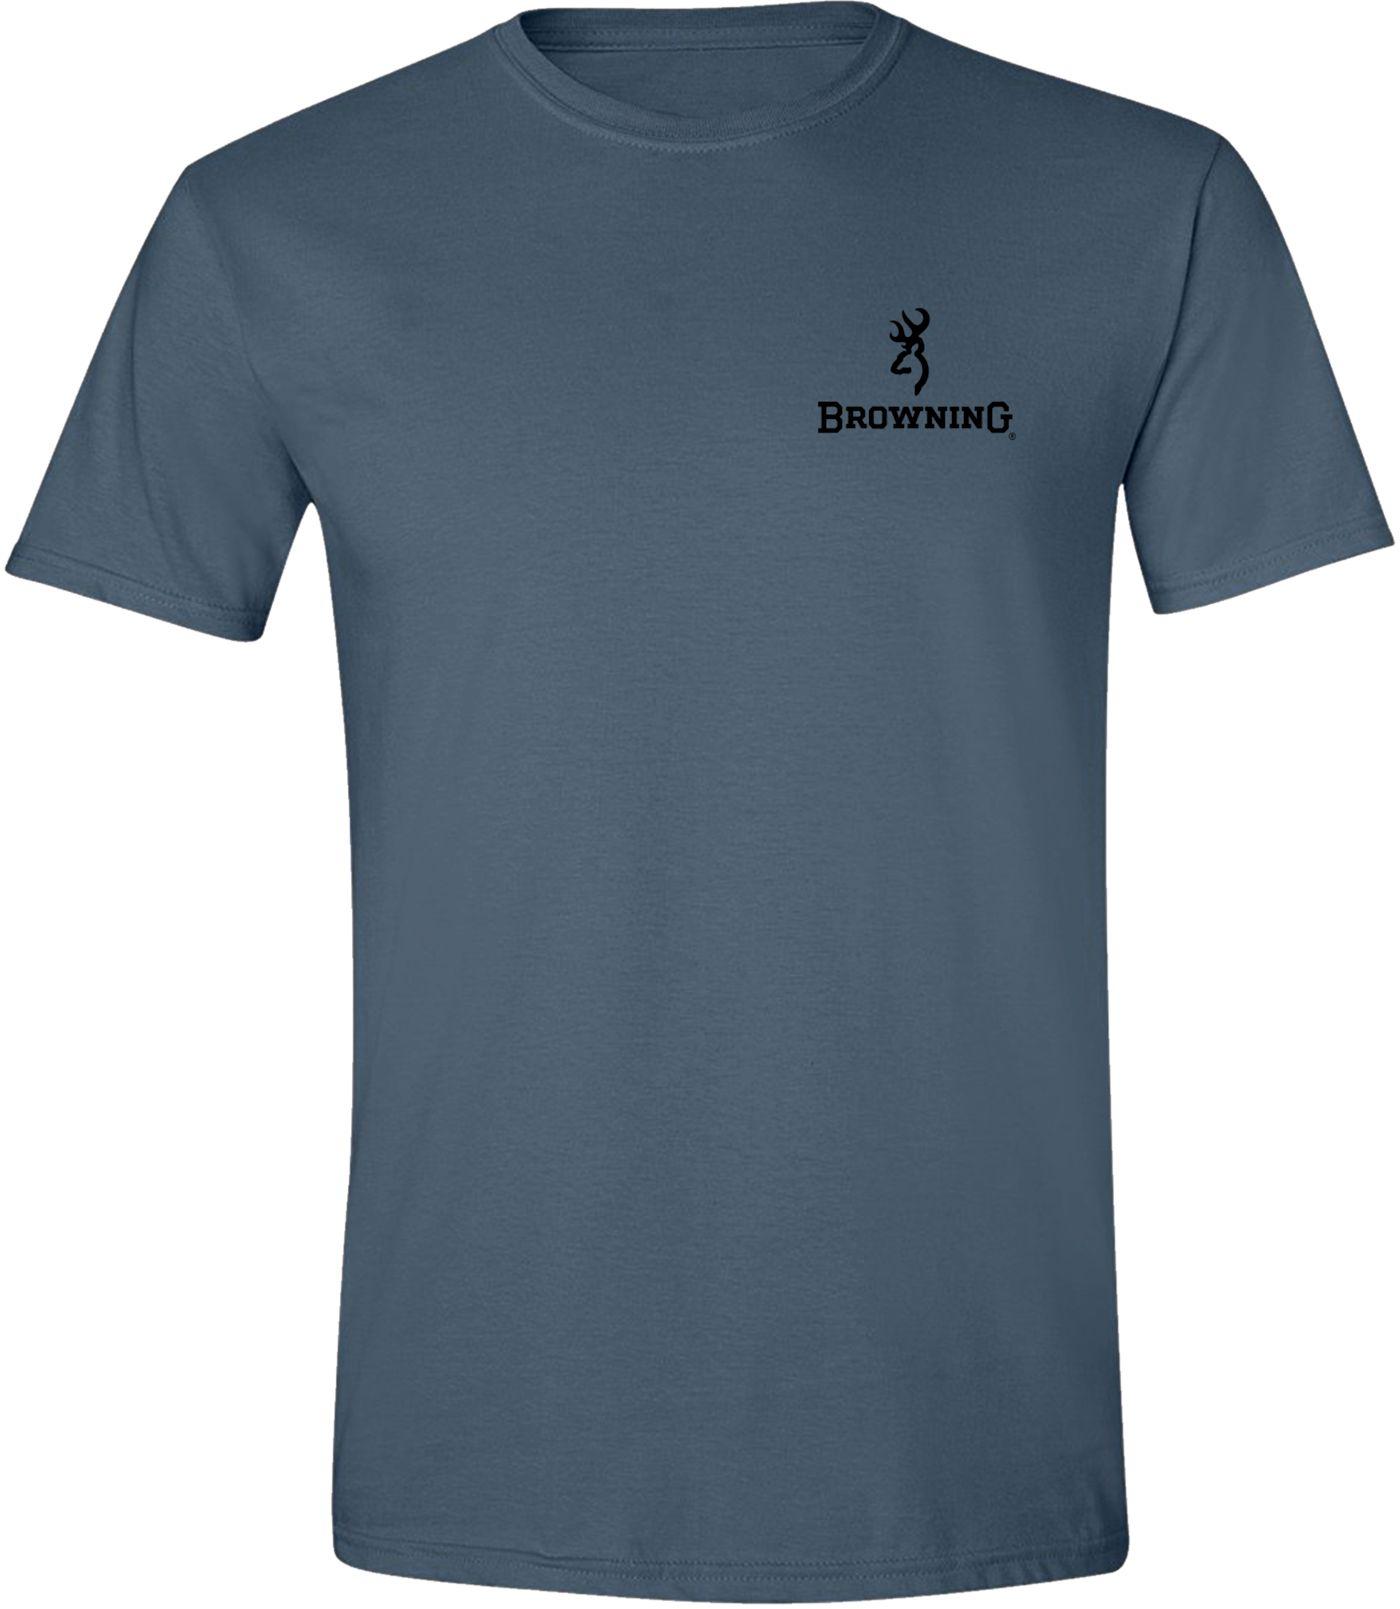 Browning Men's Box T-Shirt